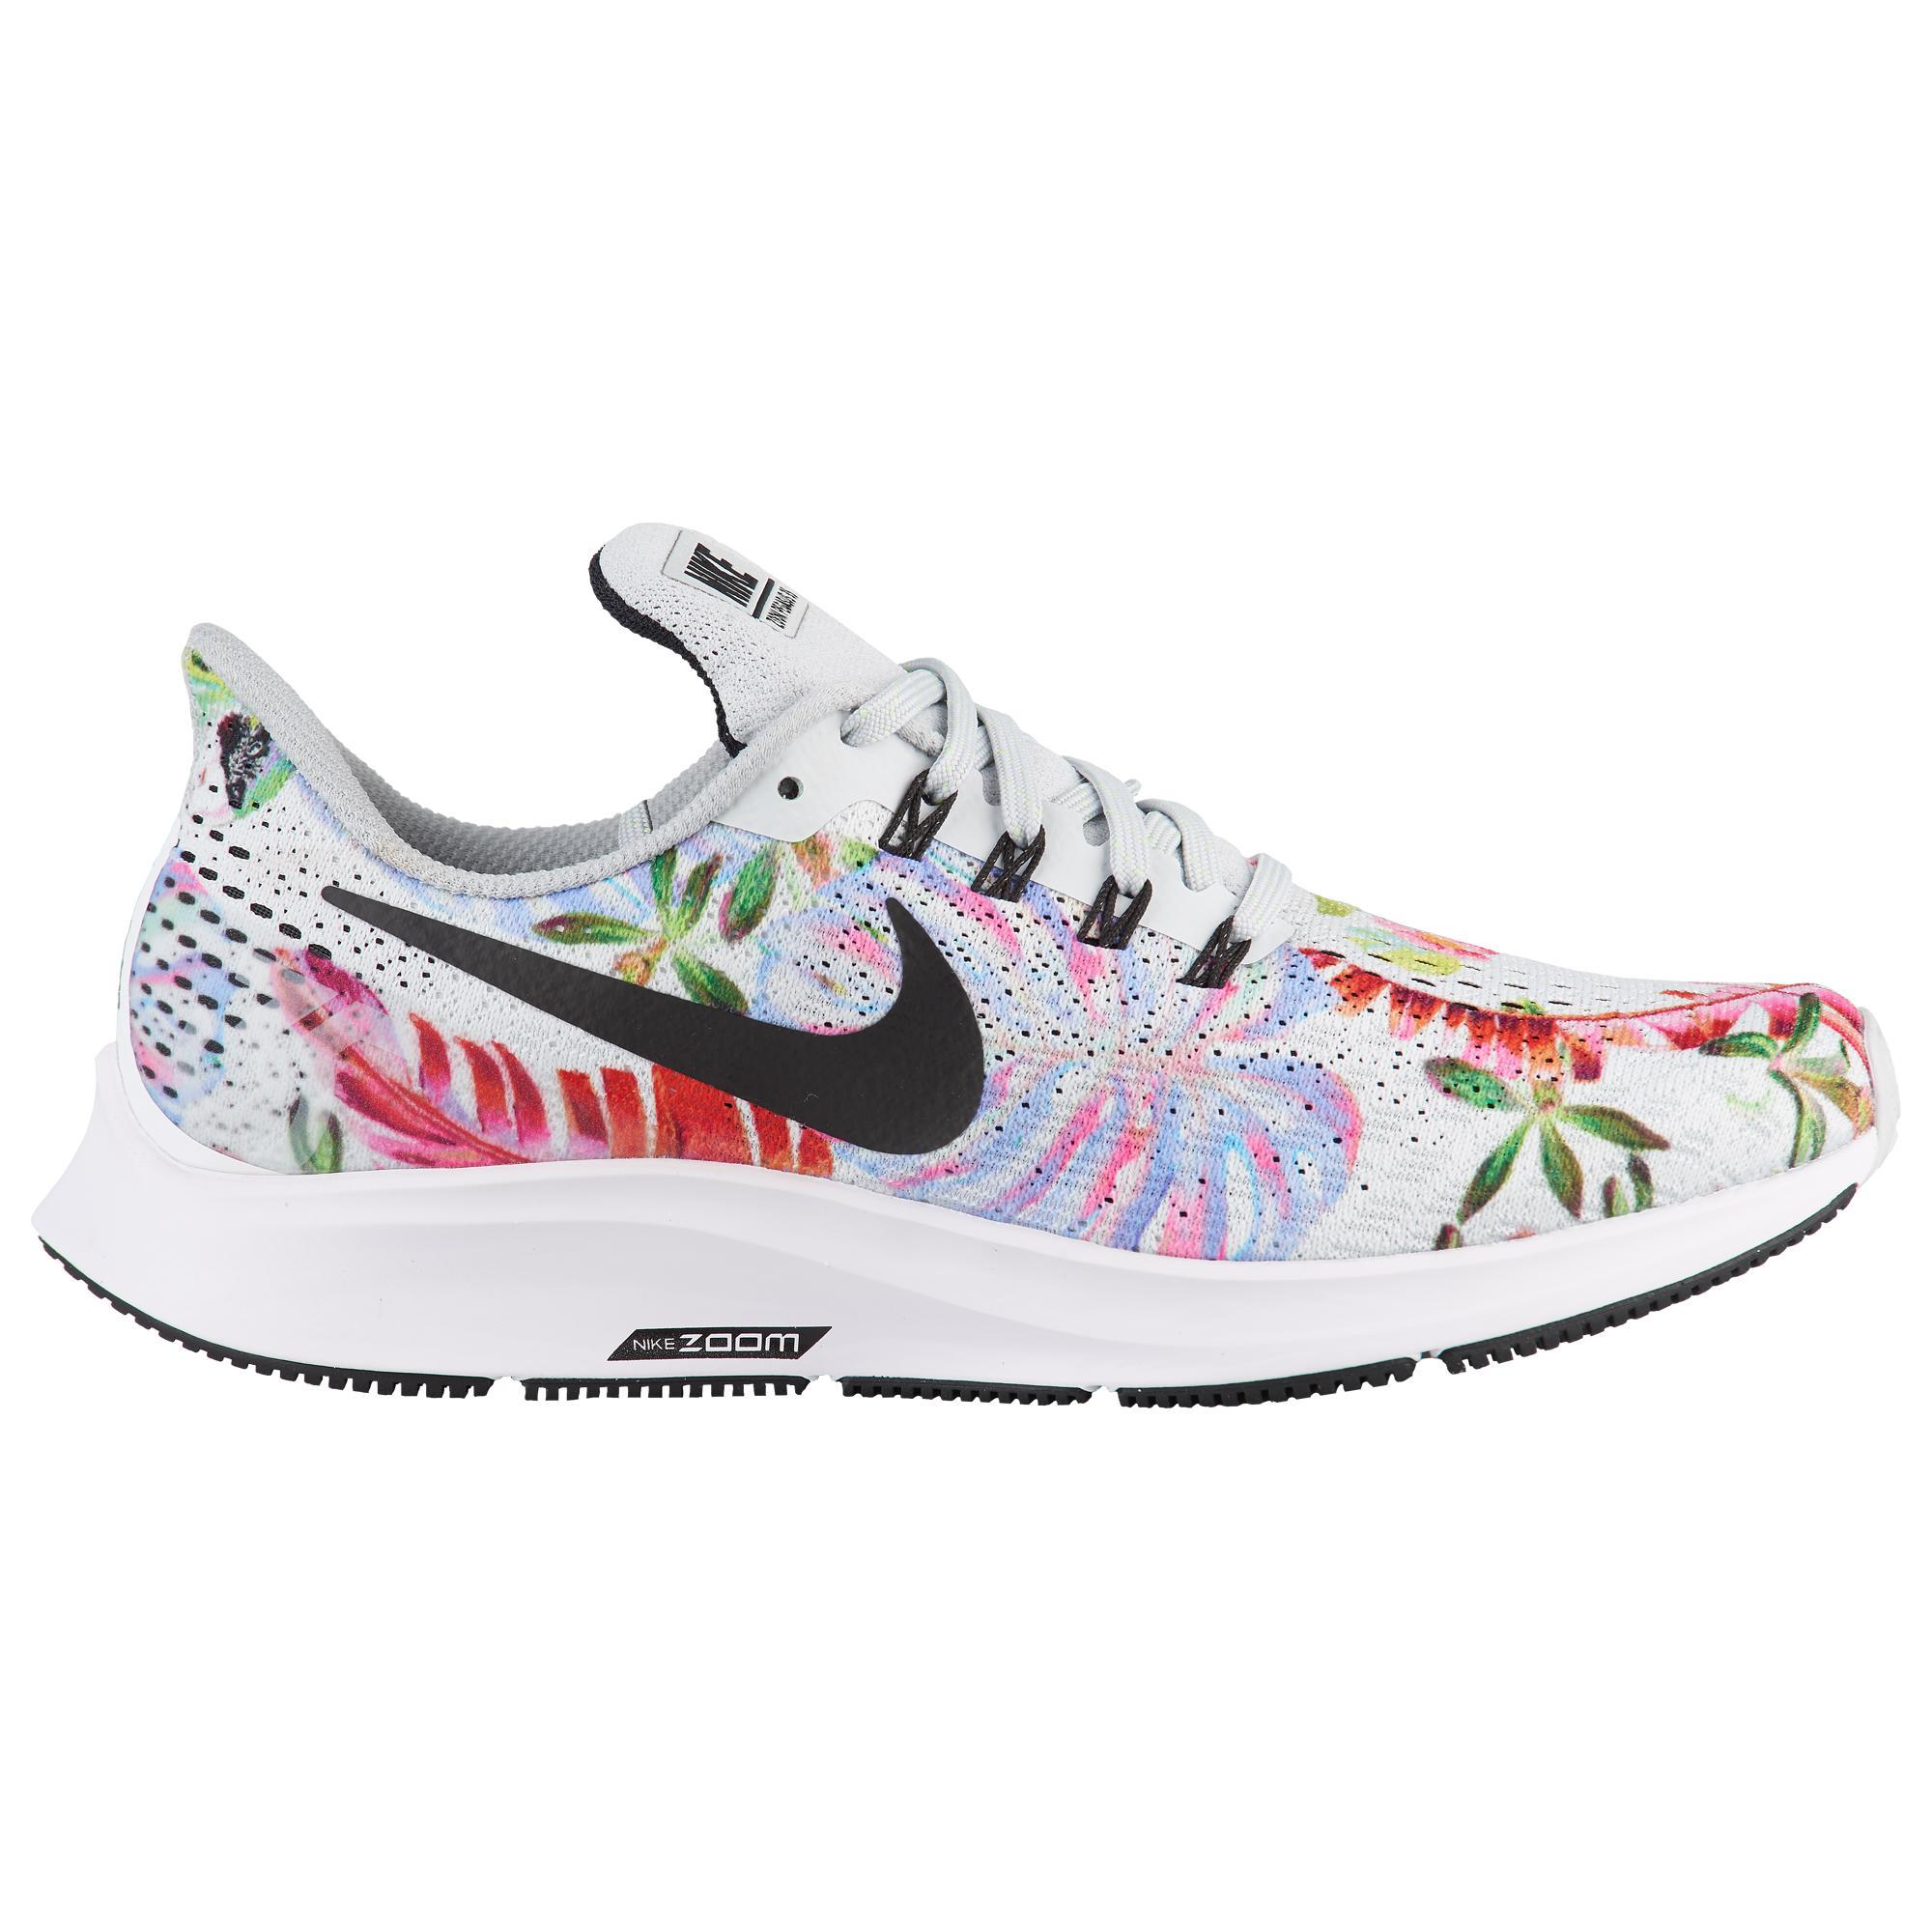 02e28185bc34 Lyst - Nike Air Zoom Pegasus 35 in White